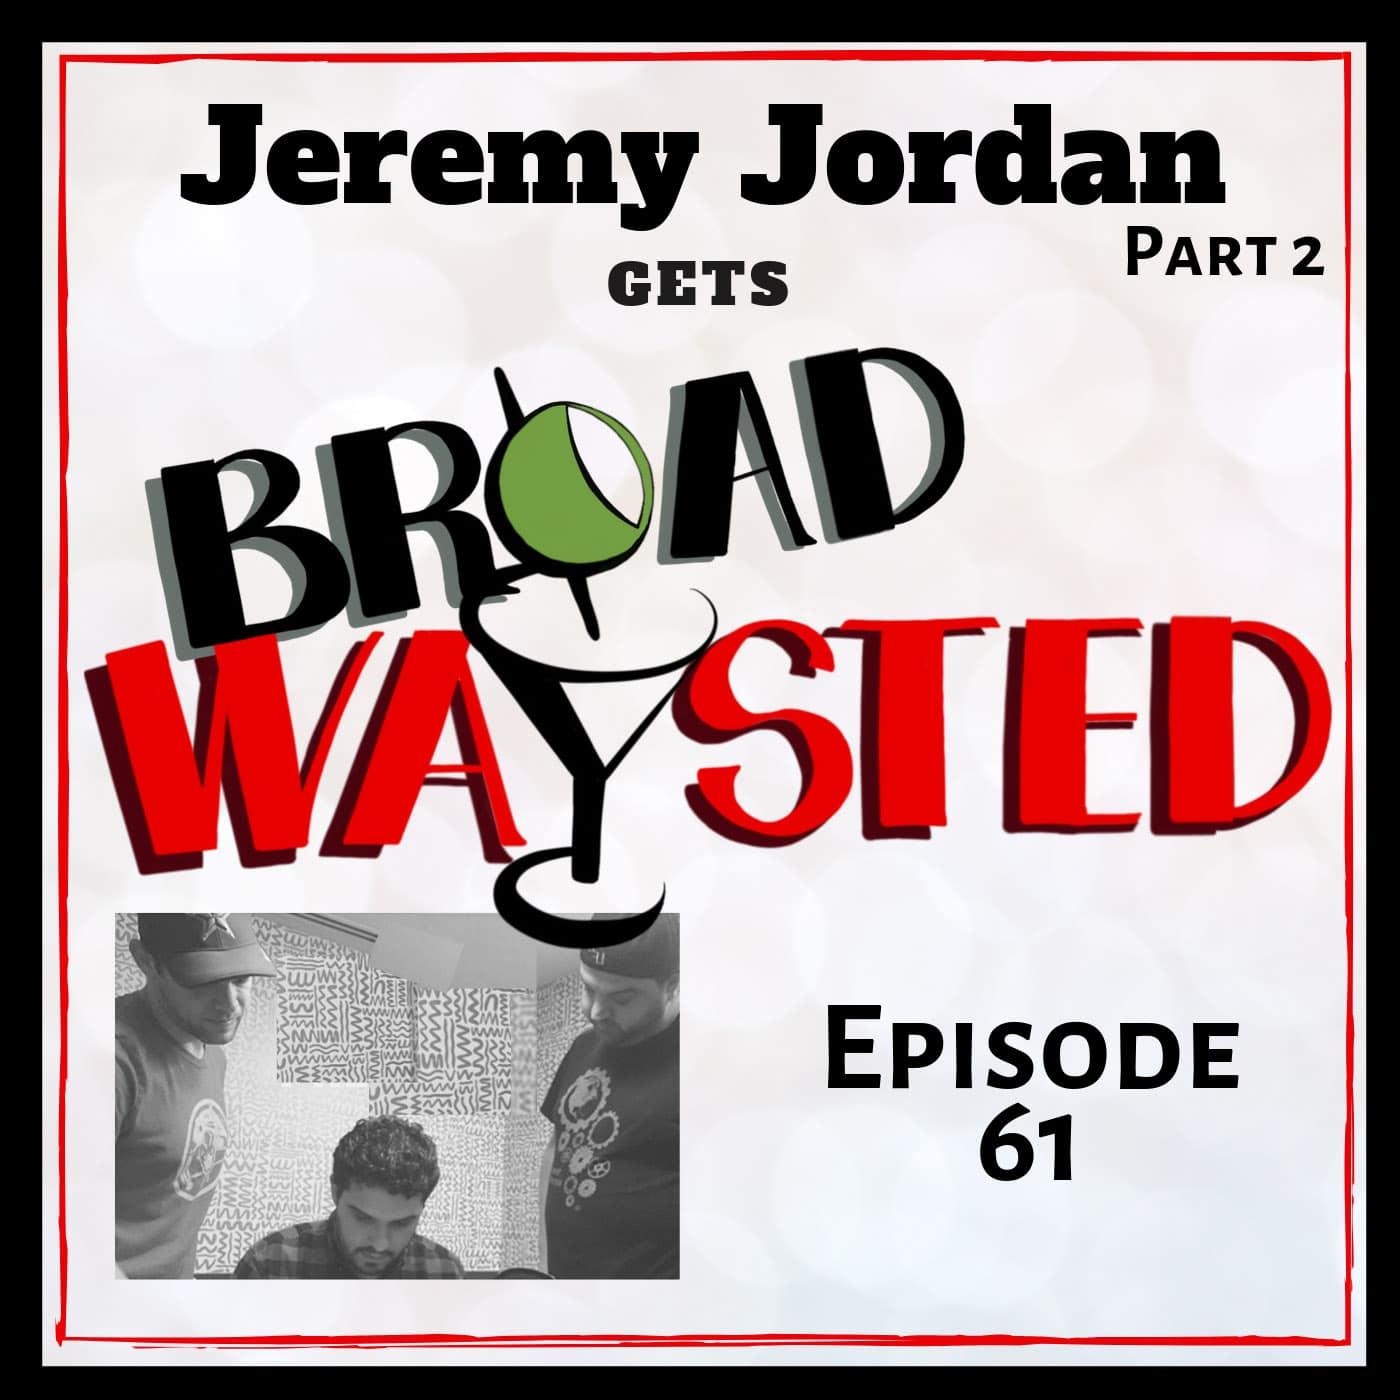 Broadwaysted Ep 61 Jeremy Jordan Pt 2